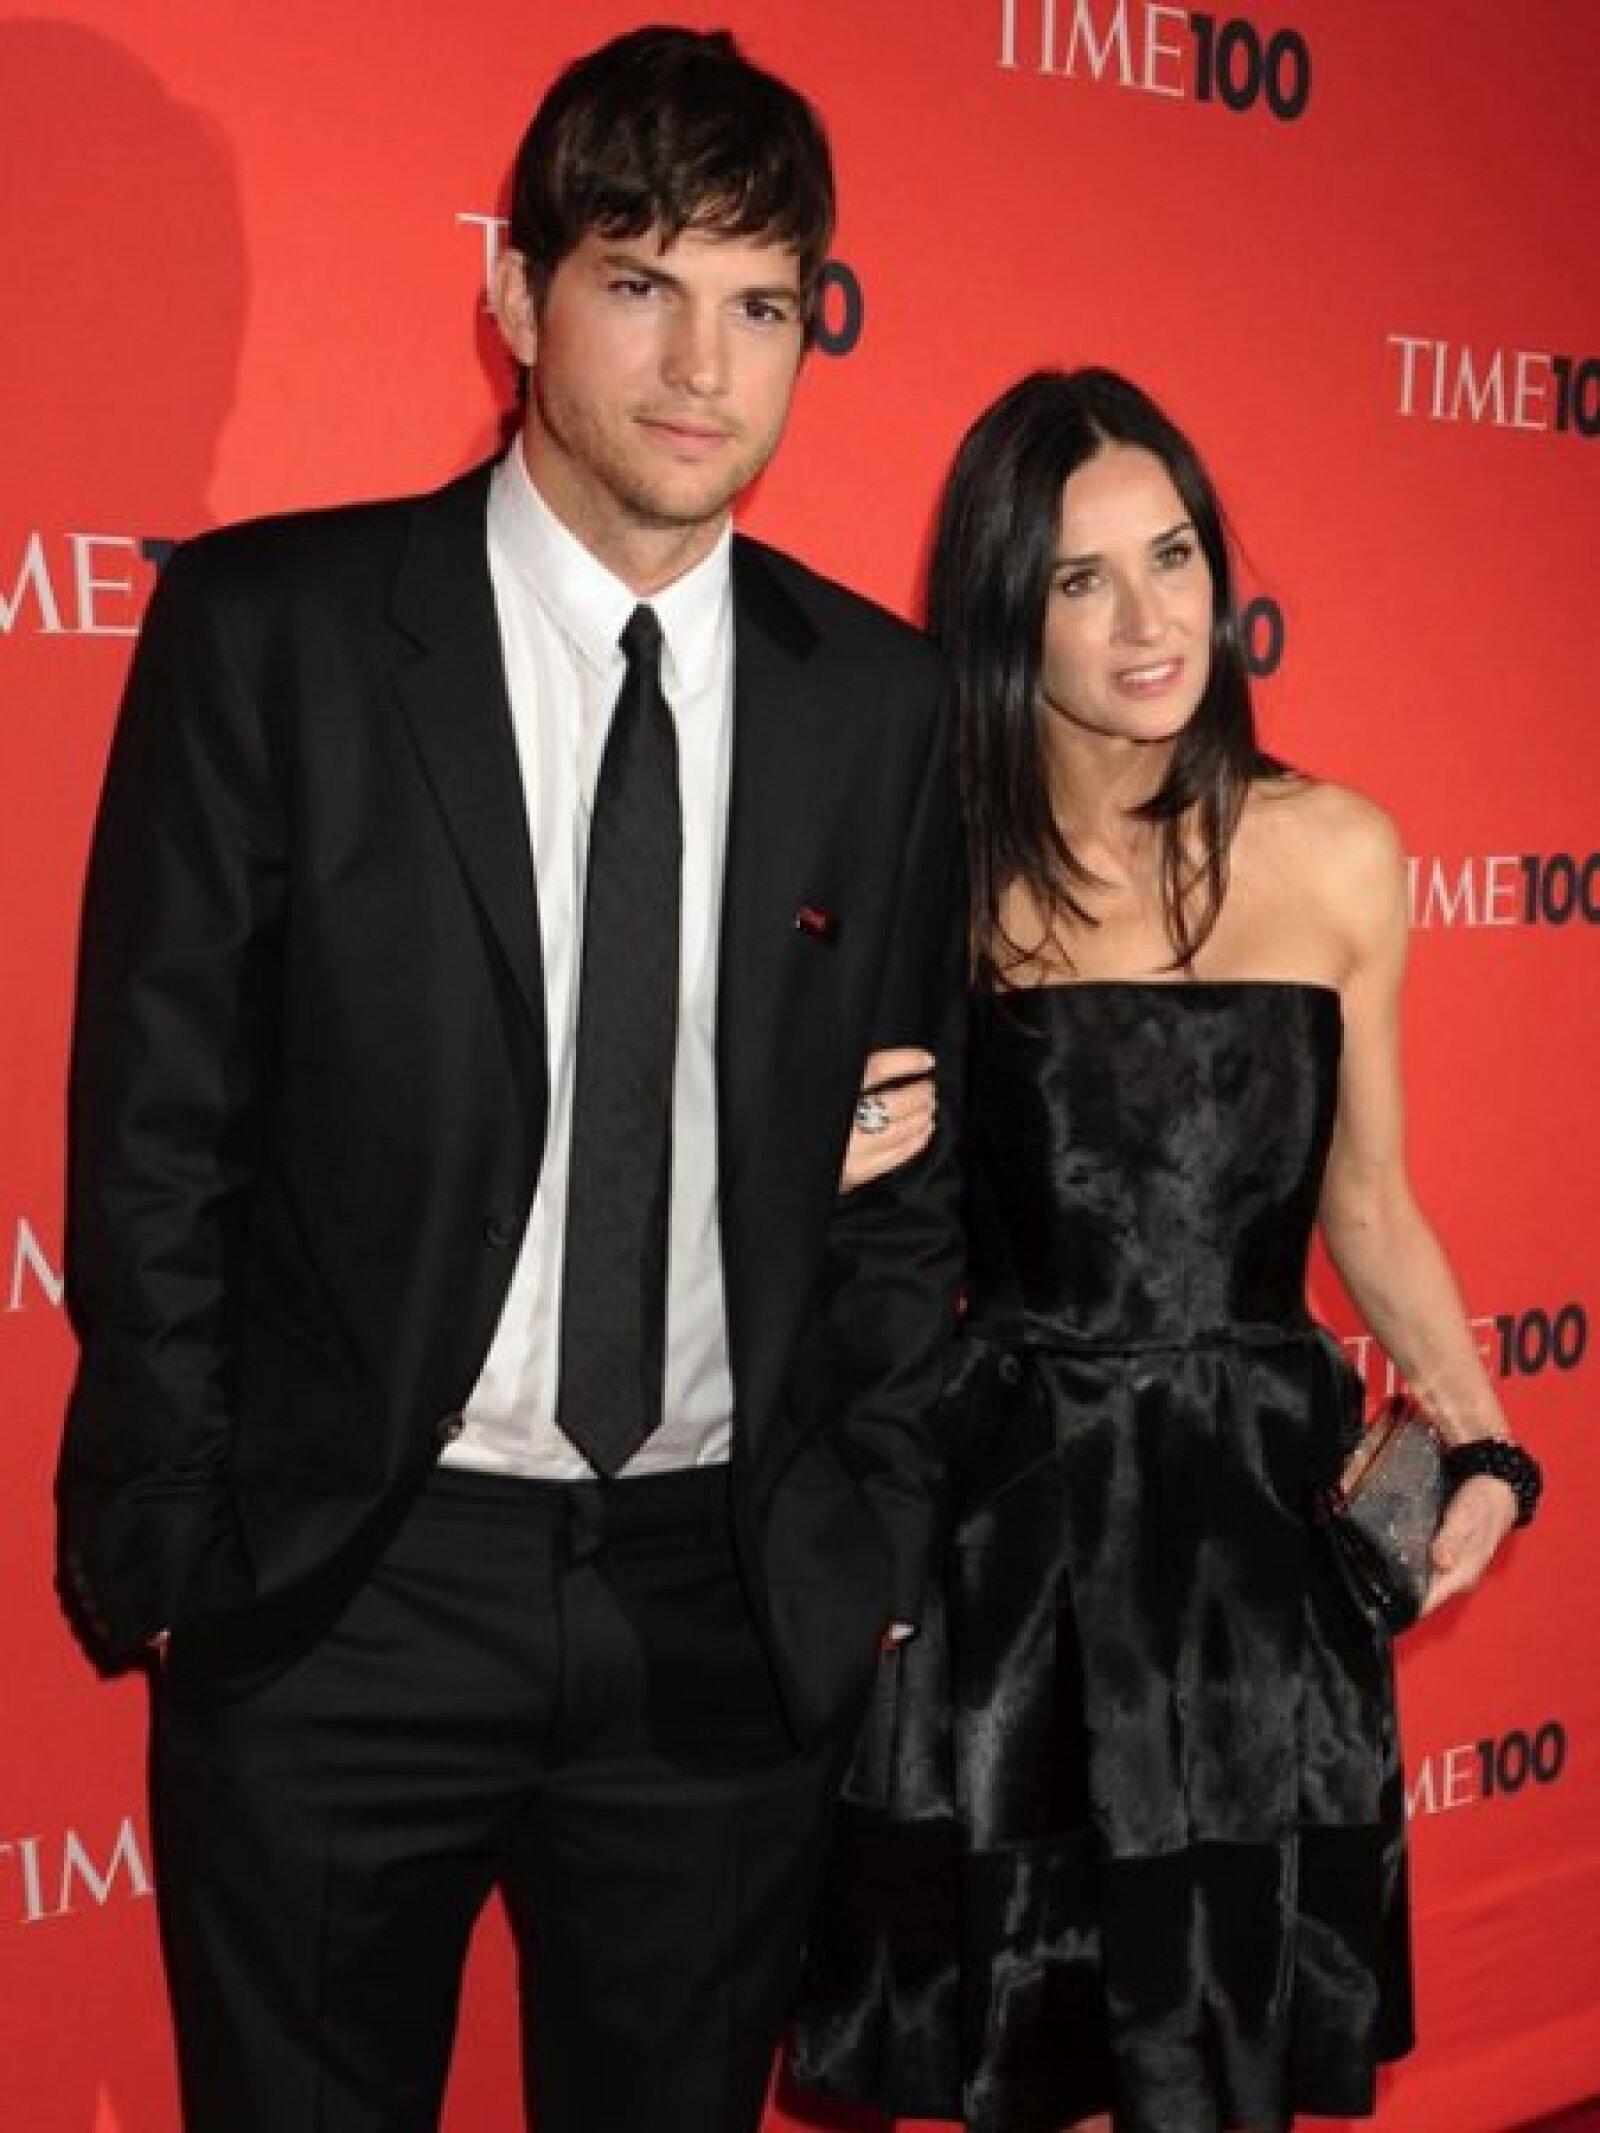 Ashton Kutcher llegó de la mano de su esposa, la actriz Demi Moore